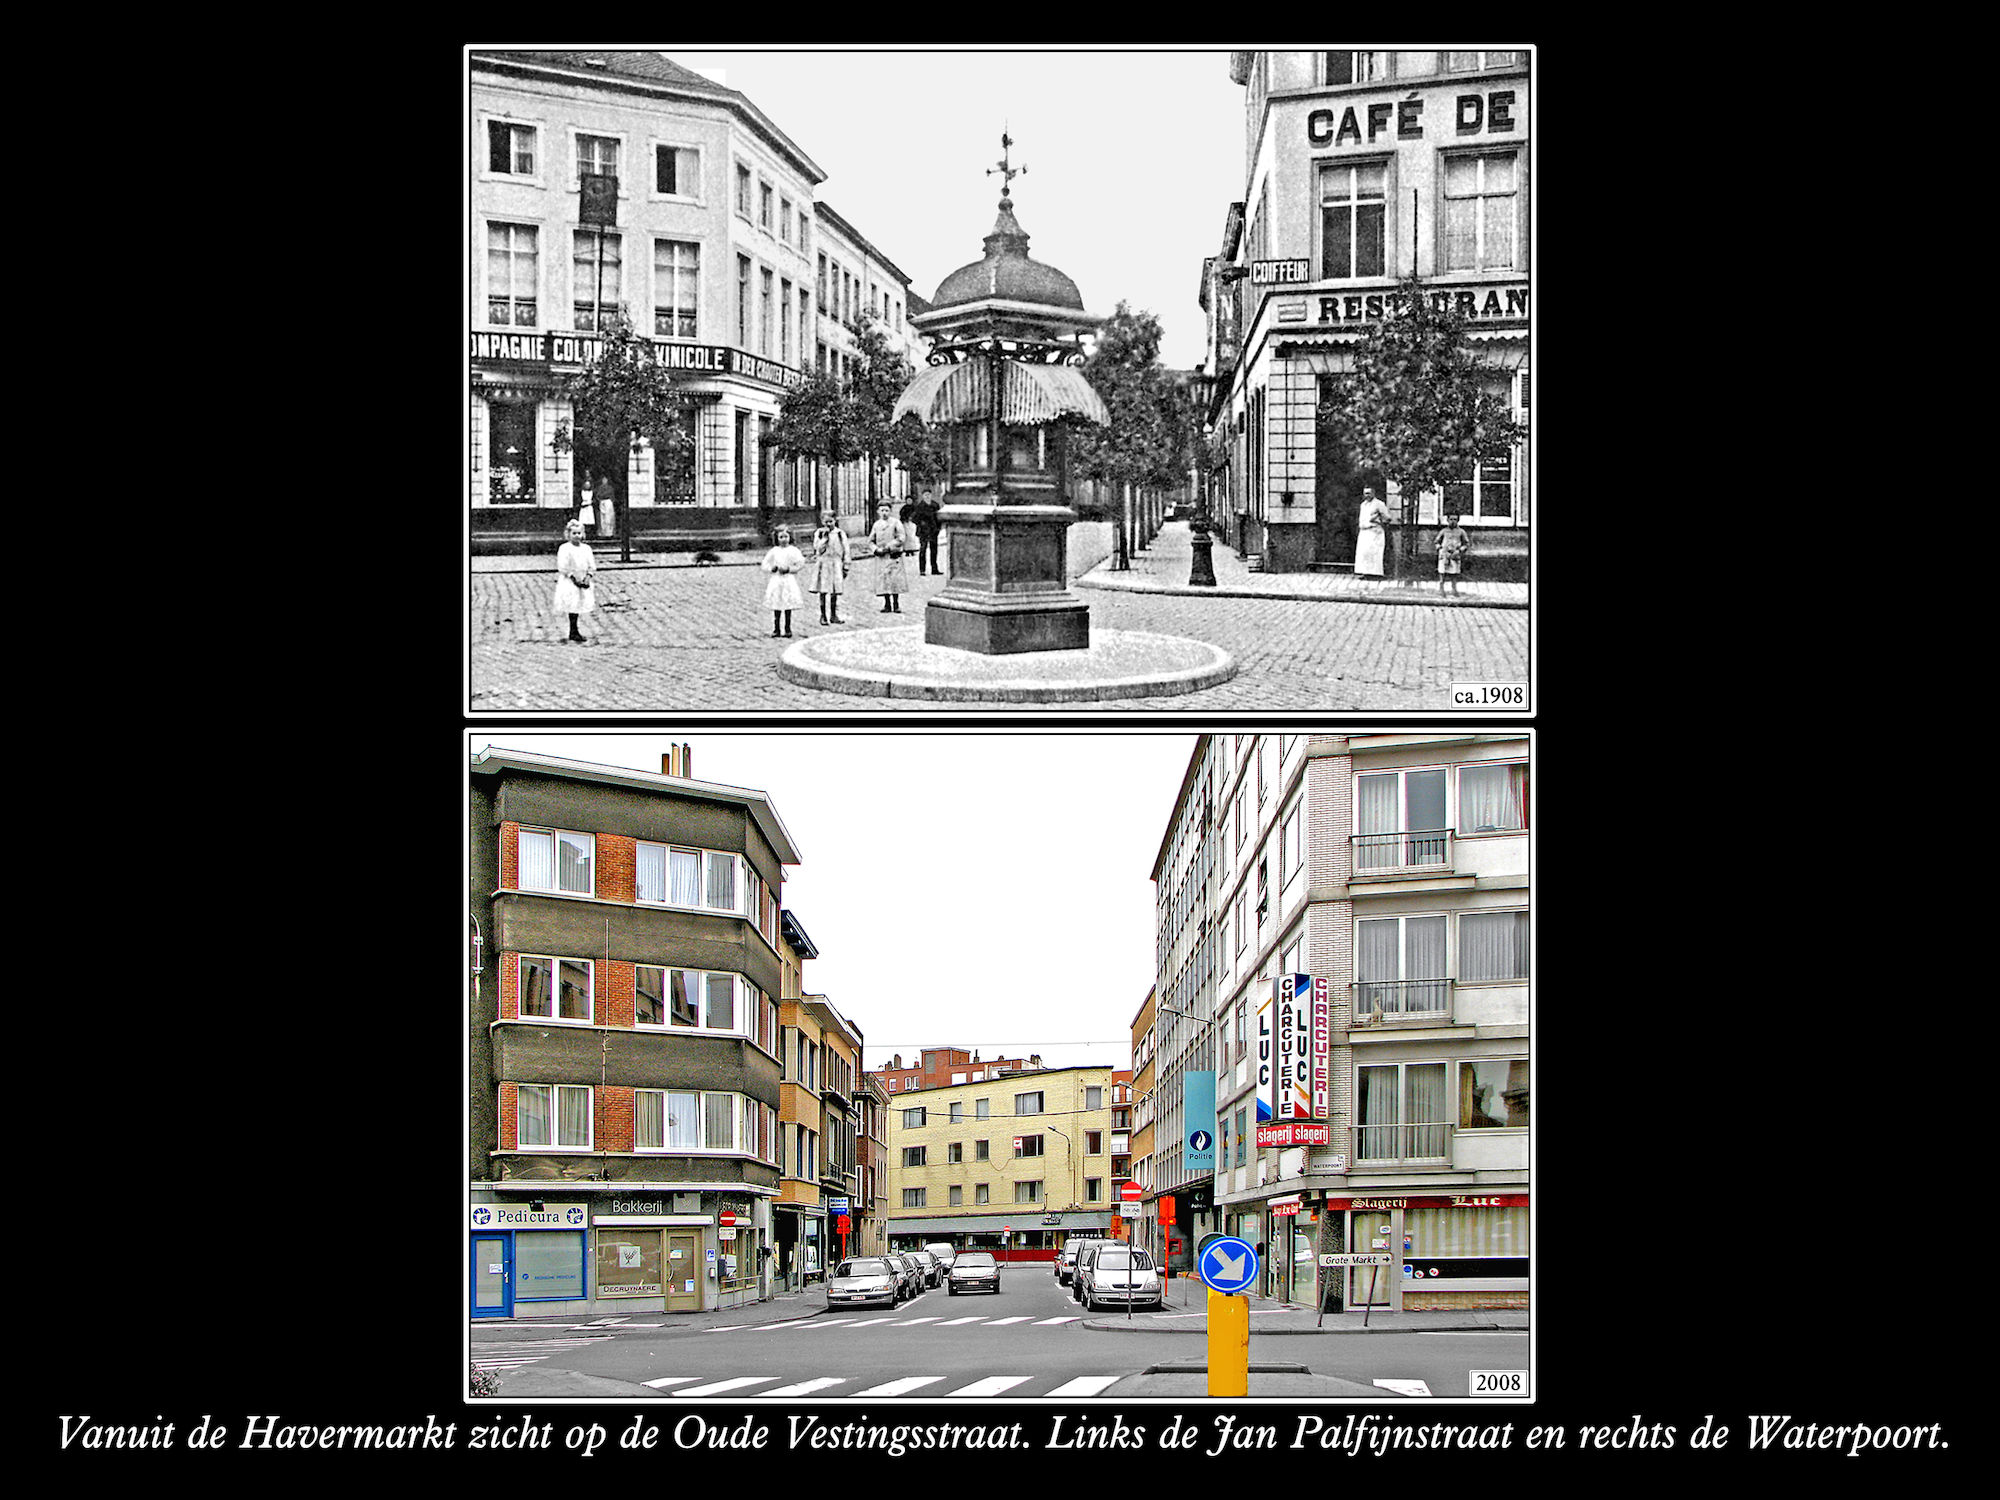 Waterpoort - Oude Vestingsstraat 1908 en 2008